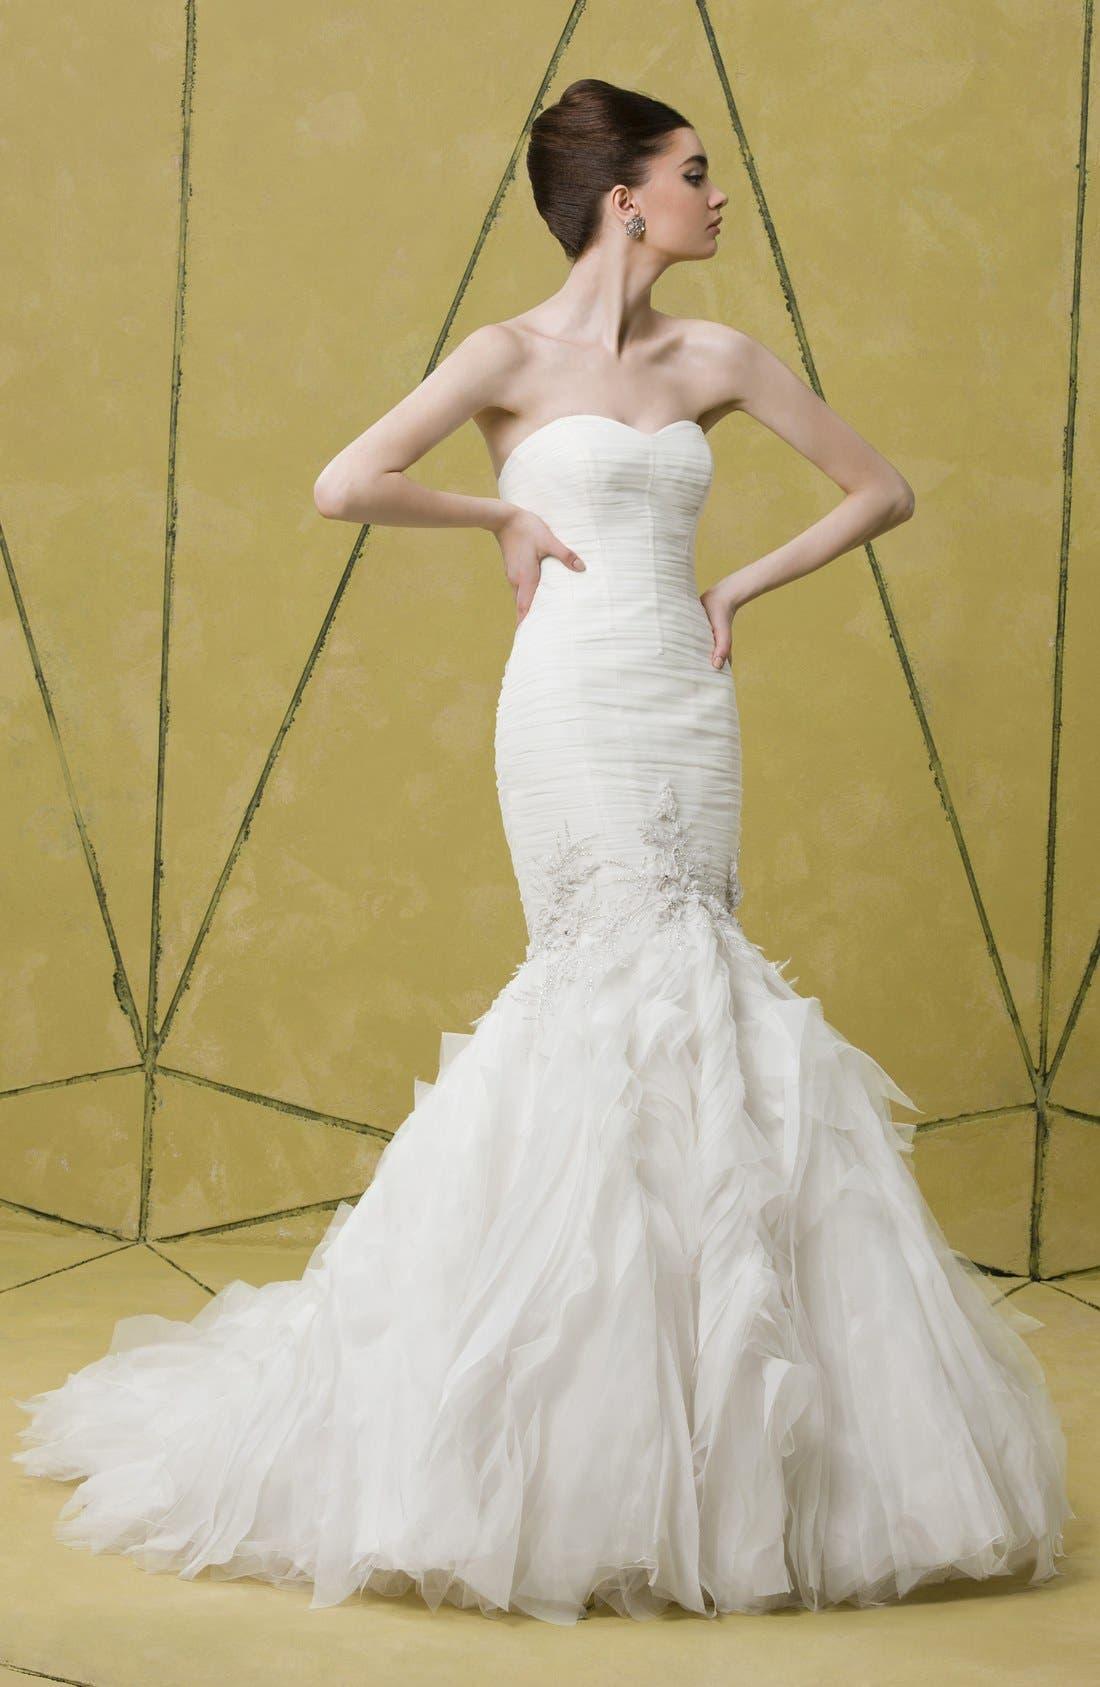 Alternate Image 4  - Badgley Mischka Bridal 'Bridgette' Embellished Tulle Mermaid Dress (In Stores Only)